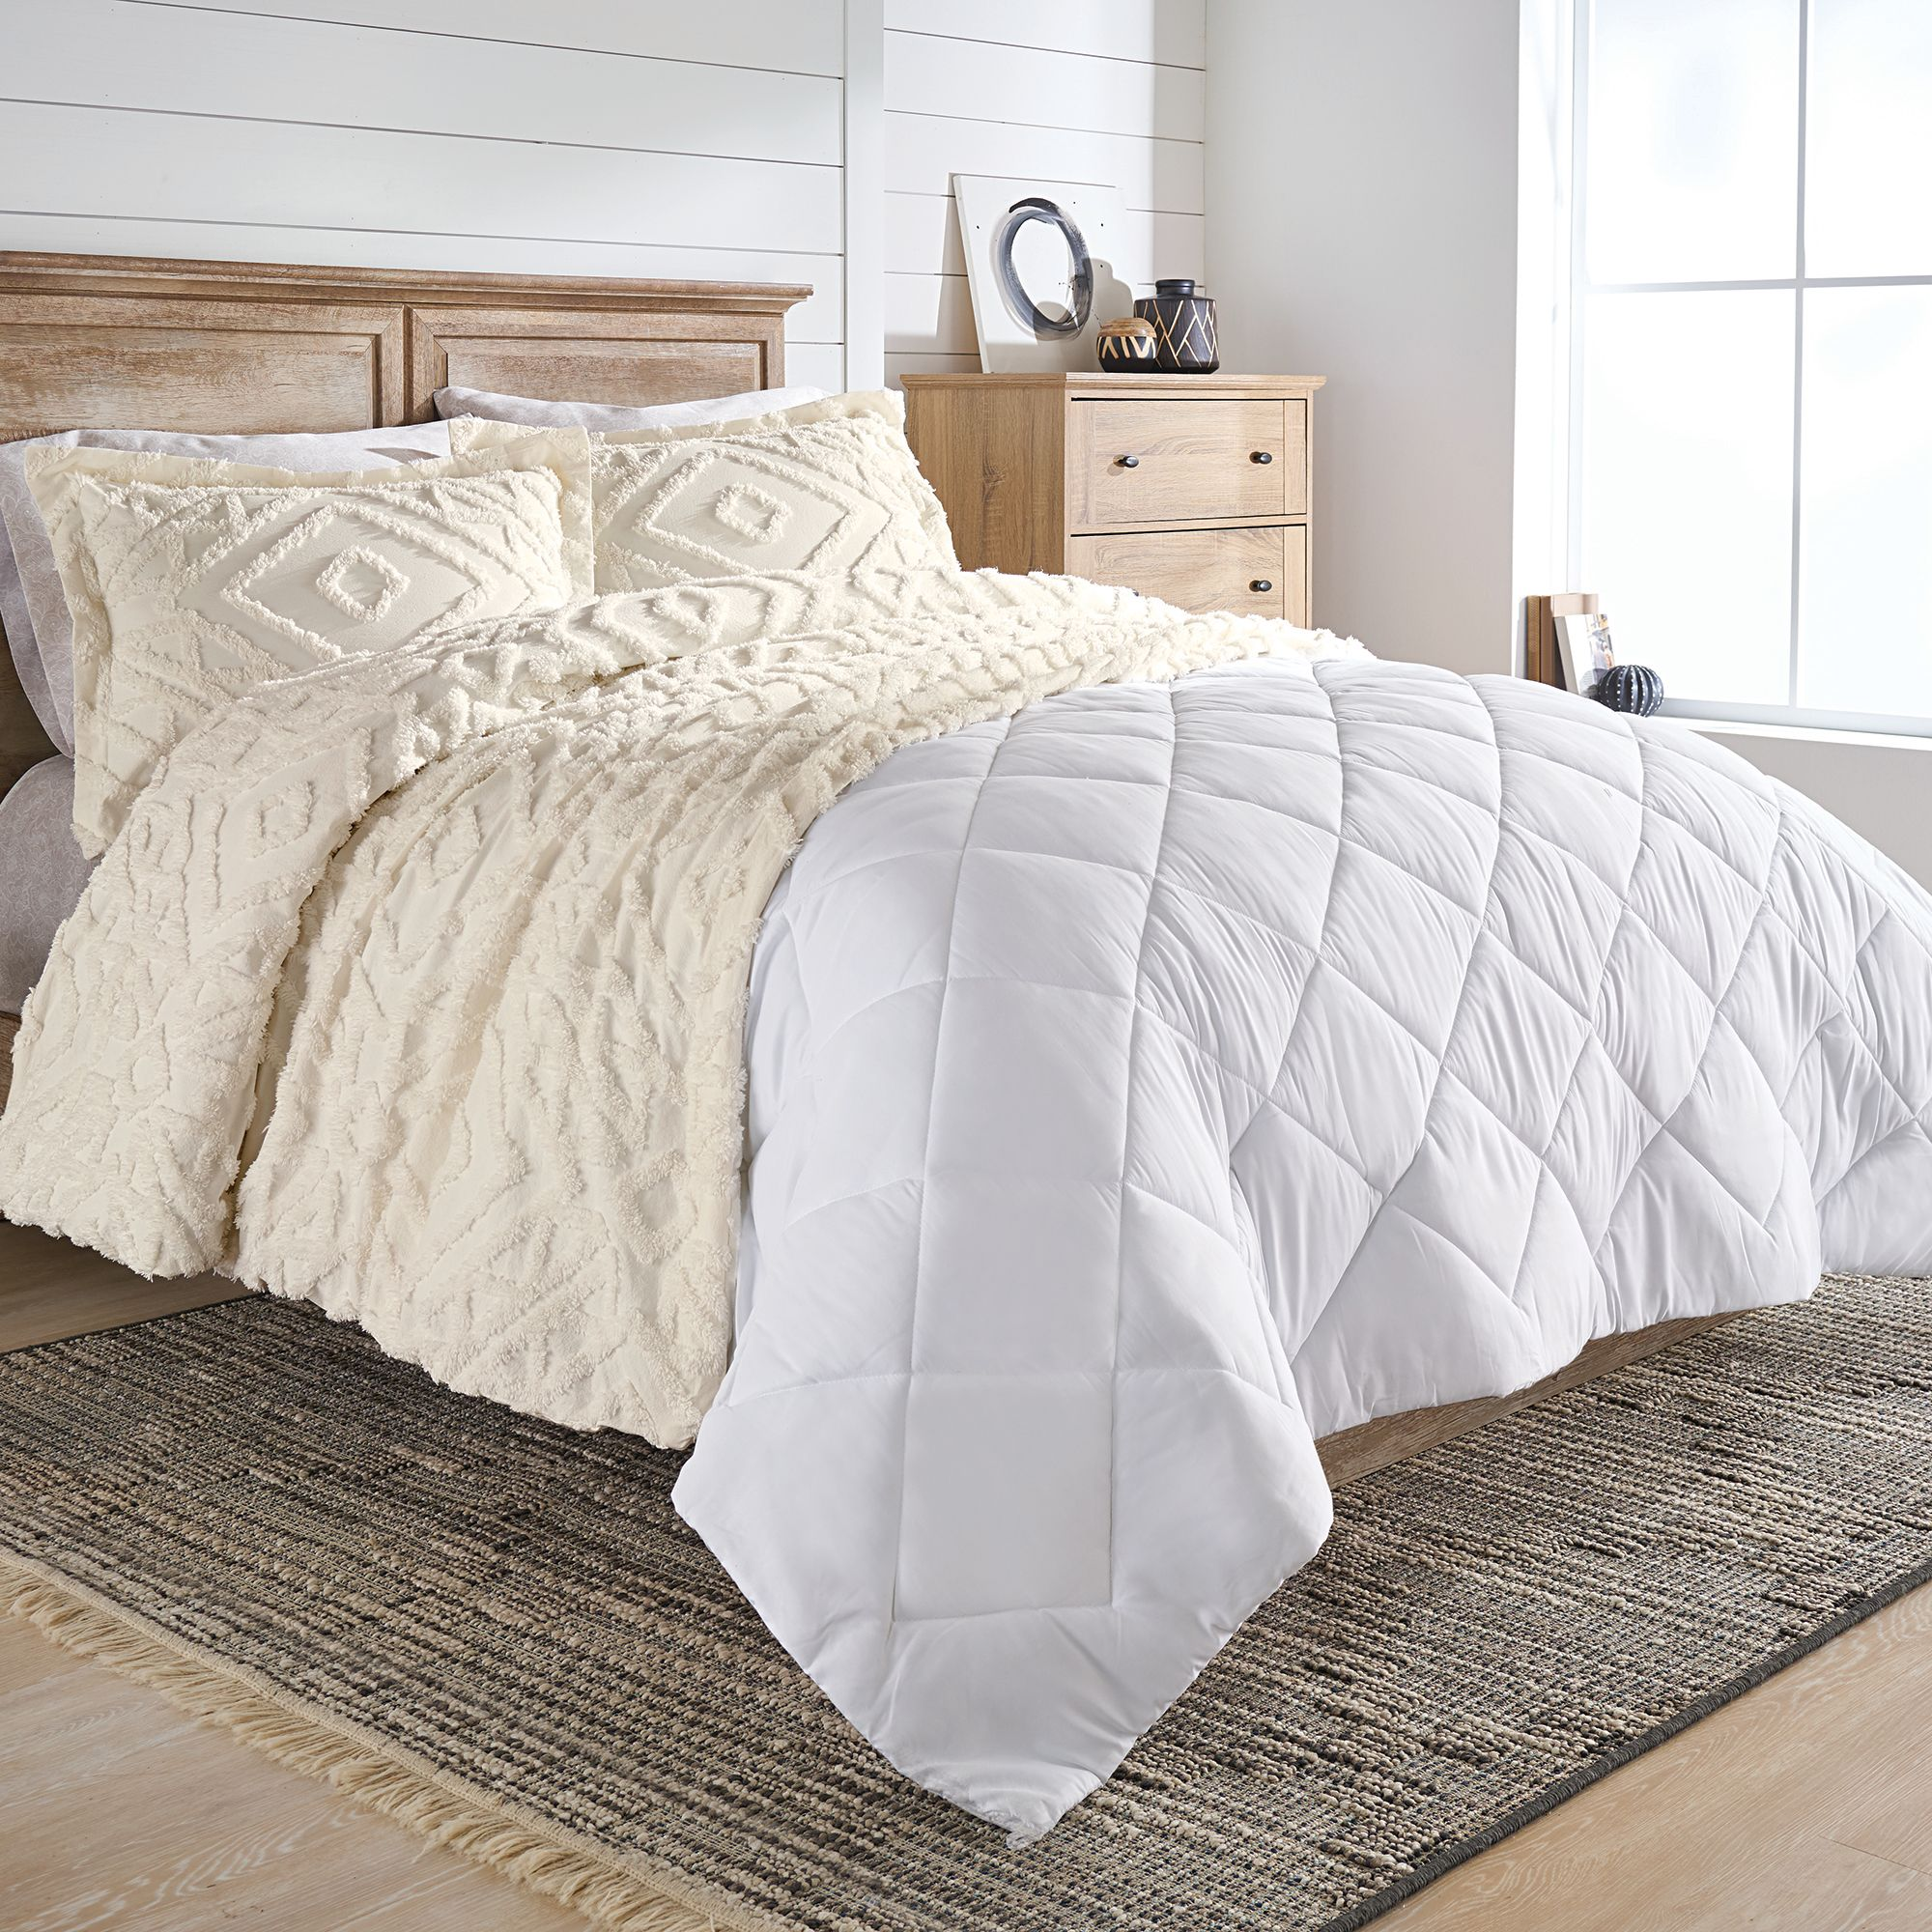 Better Homes And Gardens Chenille 3 Piece Duvet Cover Set Full Queen Ivory Walmart Com Walmart Com